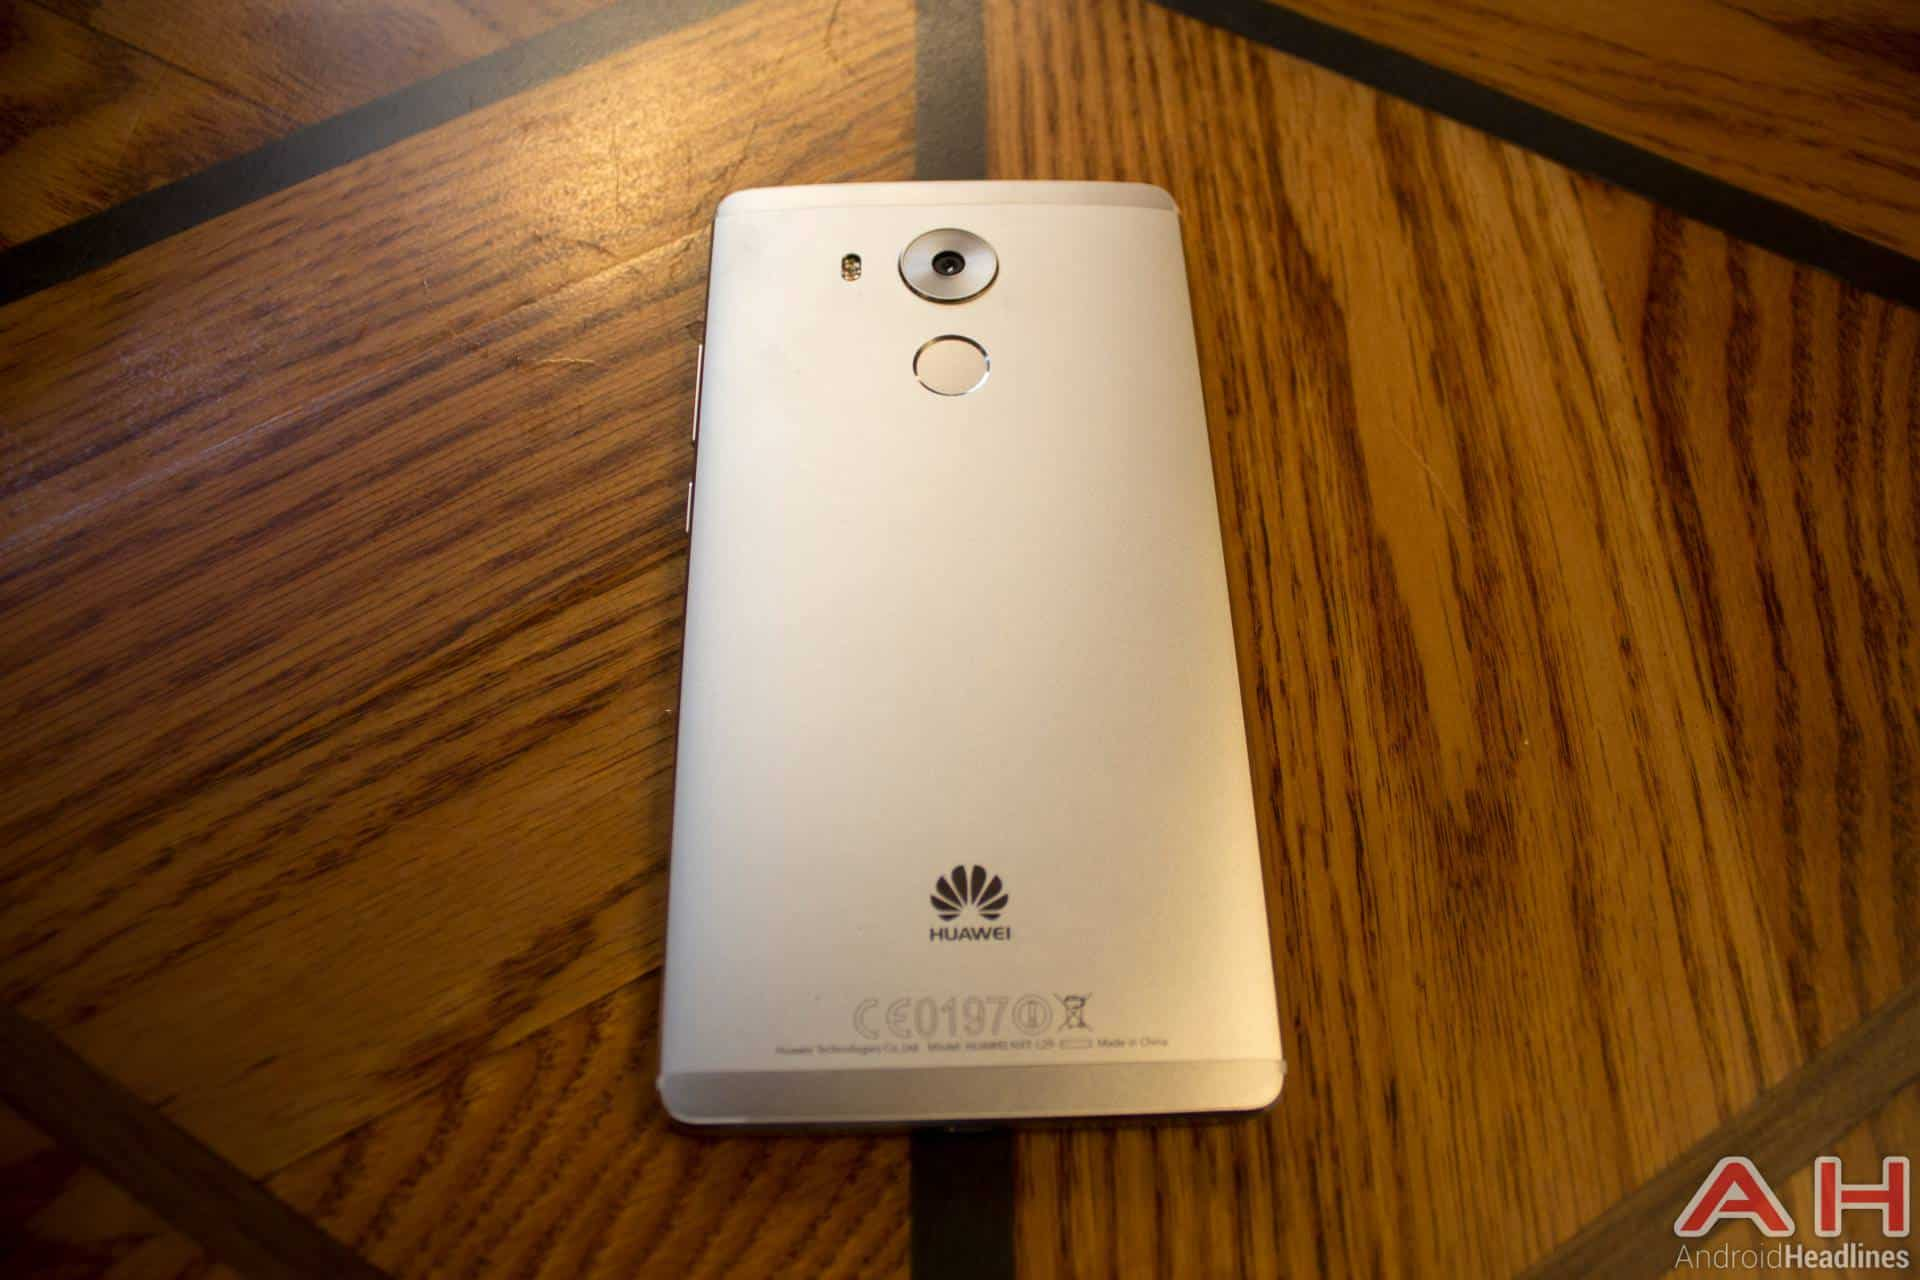 Huawei Mate 8 CES 2016 AH 12